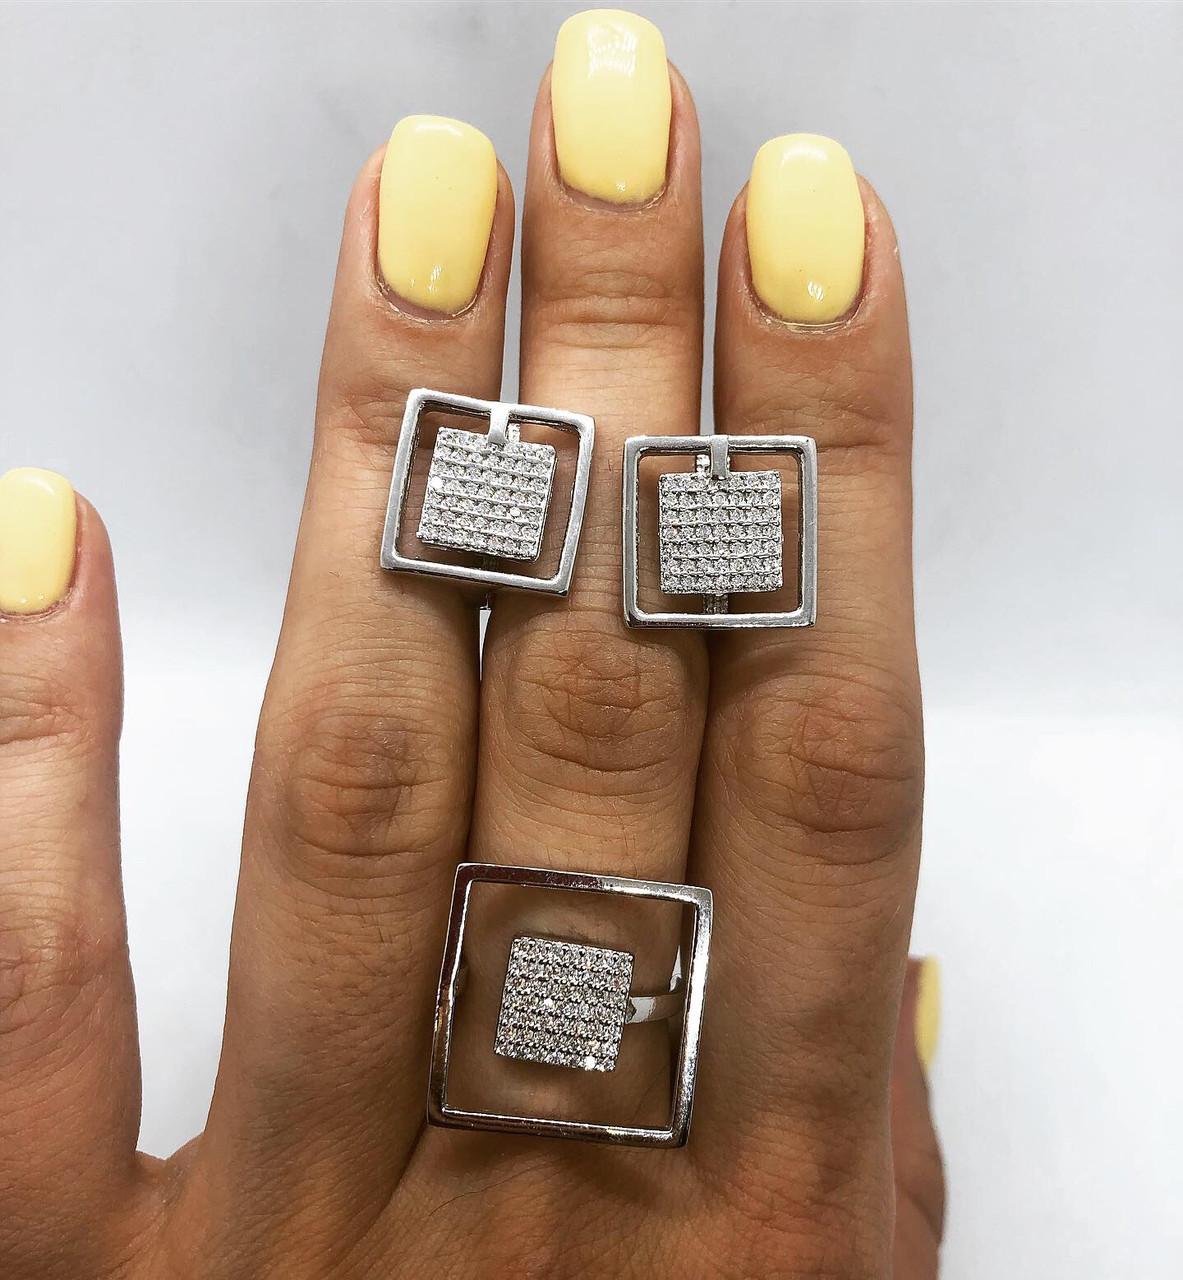 Набор украшений My Jewels из серебра 925 квадрат белый, камни Swarovski (размер 17-17,5)